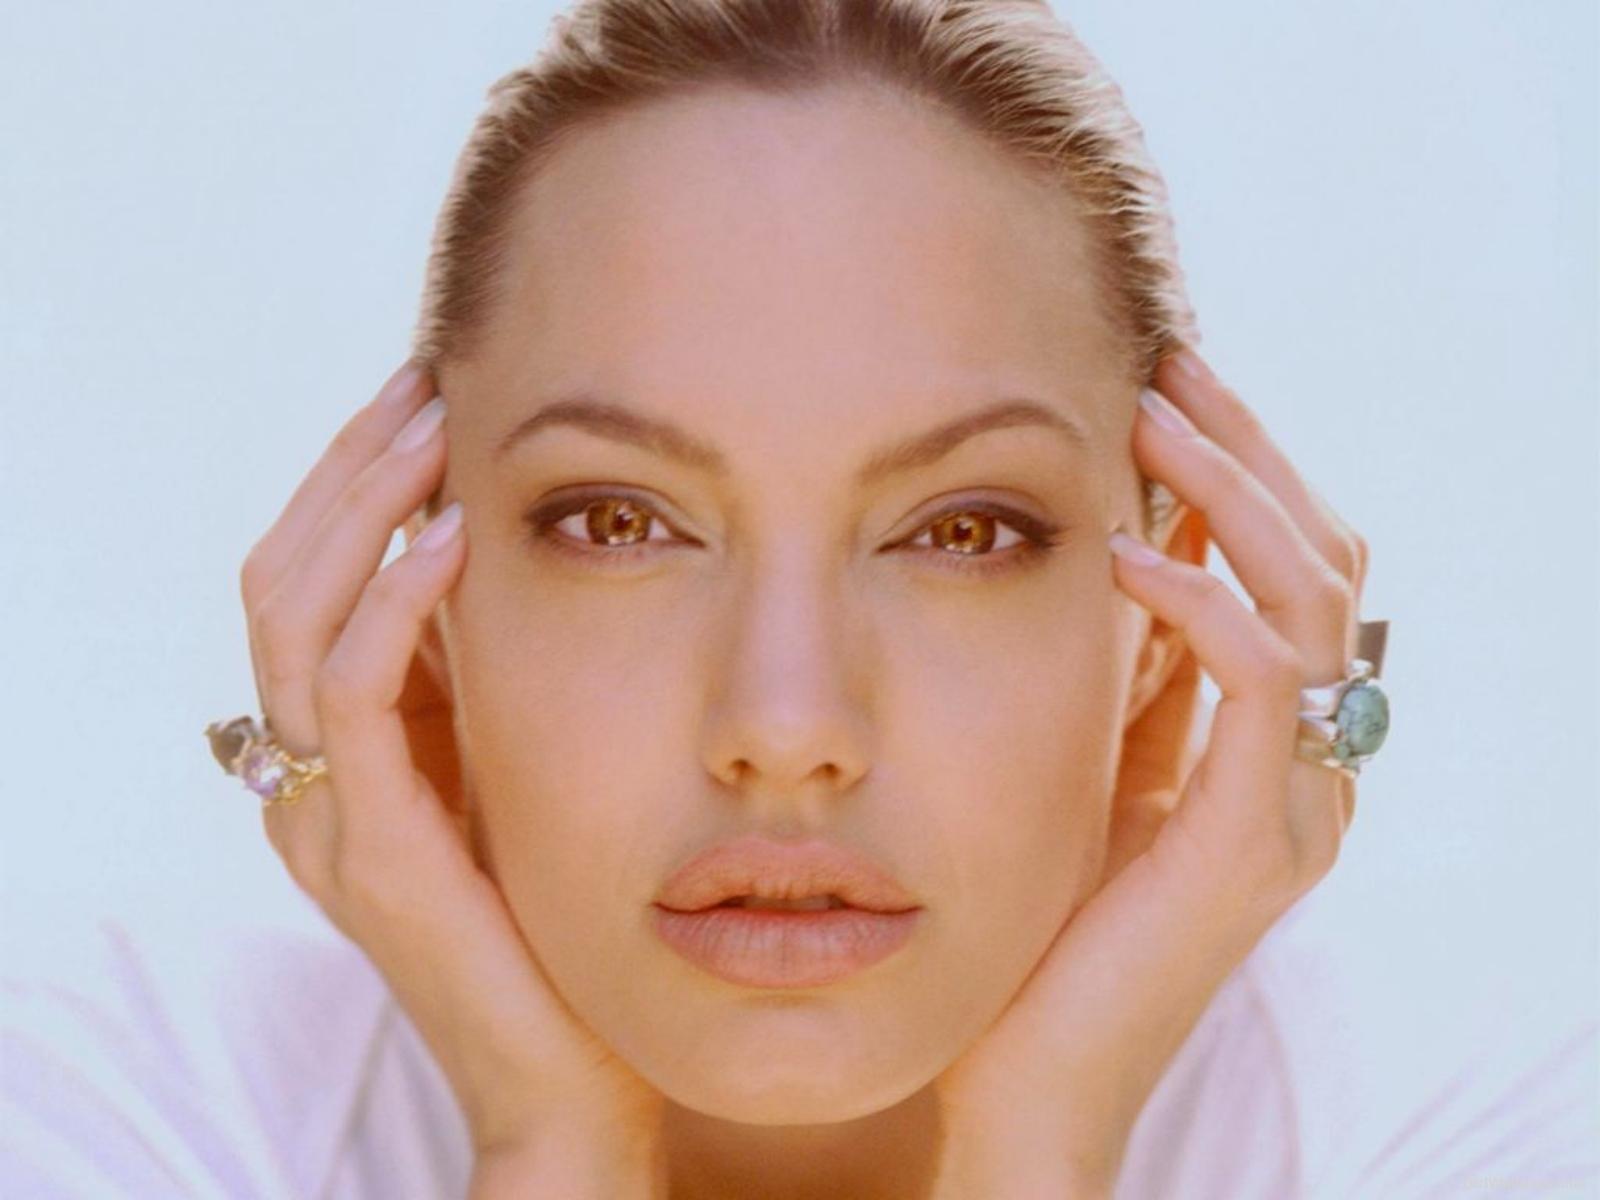 http://1.bp.blogspot.com/-c6GQ05lxwT8/T55qe9mmj5I/AAAAAAAABYM/mc96cLpuNEg/s1600/Angelina-Jolie-Clean-Face-Wallpaper.jpg